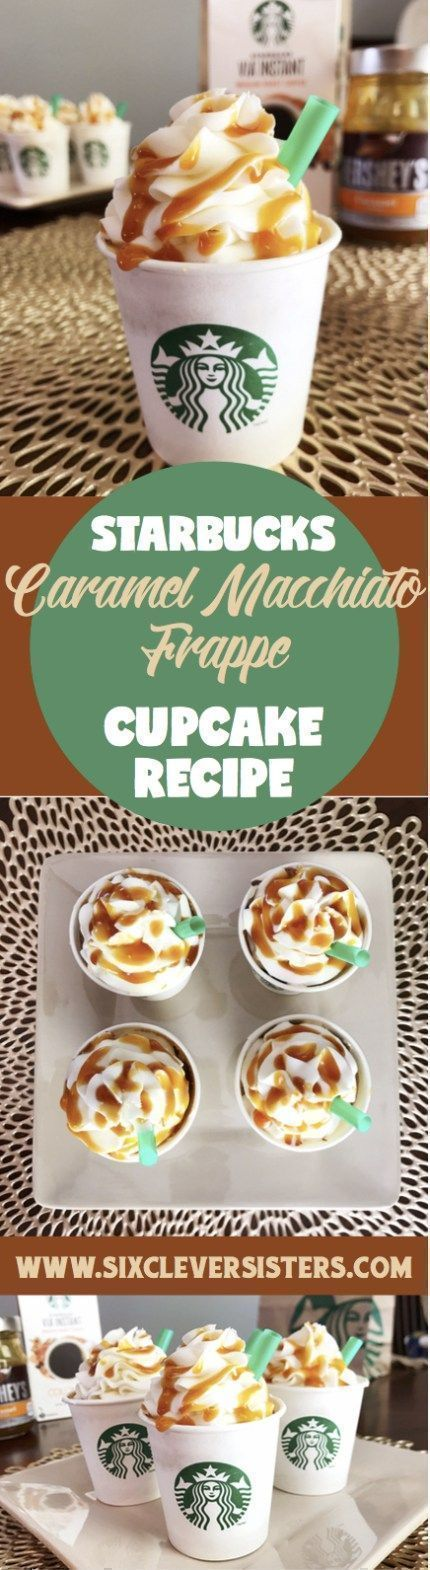 cupcake recipes for bridal shower%0A Starbucks Cupcakes   Starbucks Copycat Recipe   Cake   Cake Decorating    Starbucks Drinks   Caramel   Coffee   Coffee Drinks   Caramel Whip    Caramel